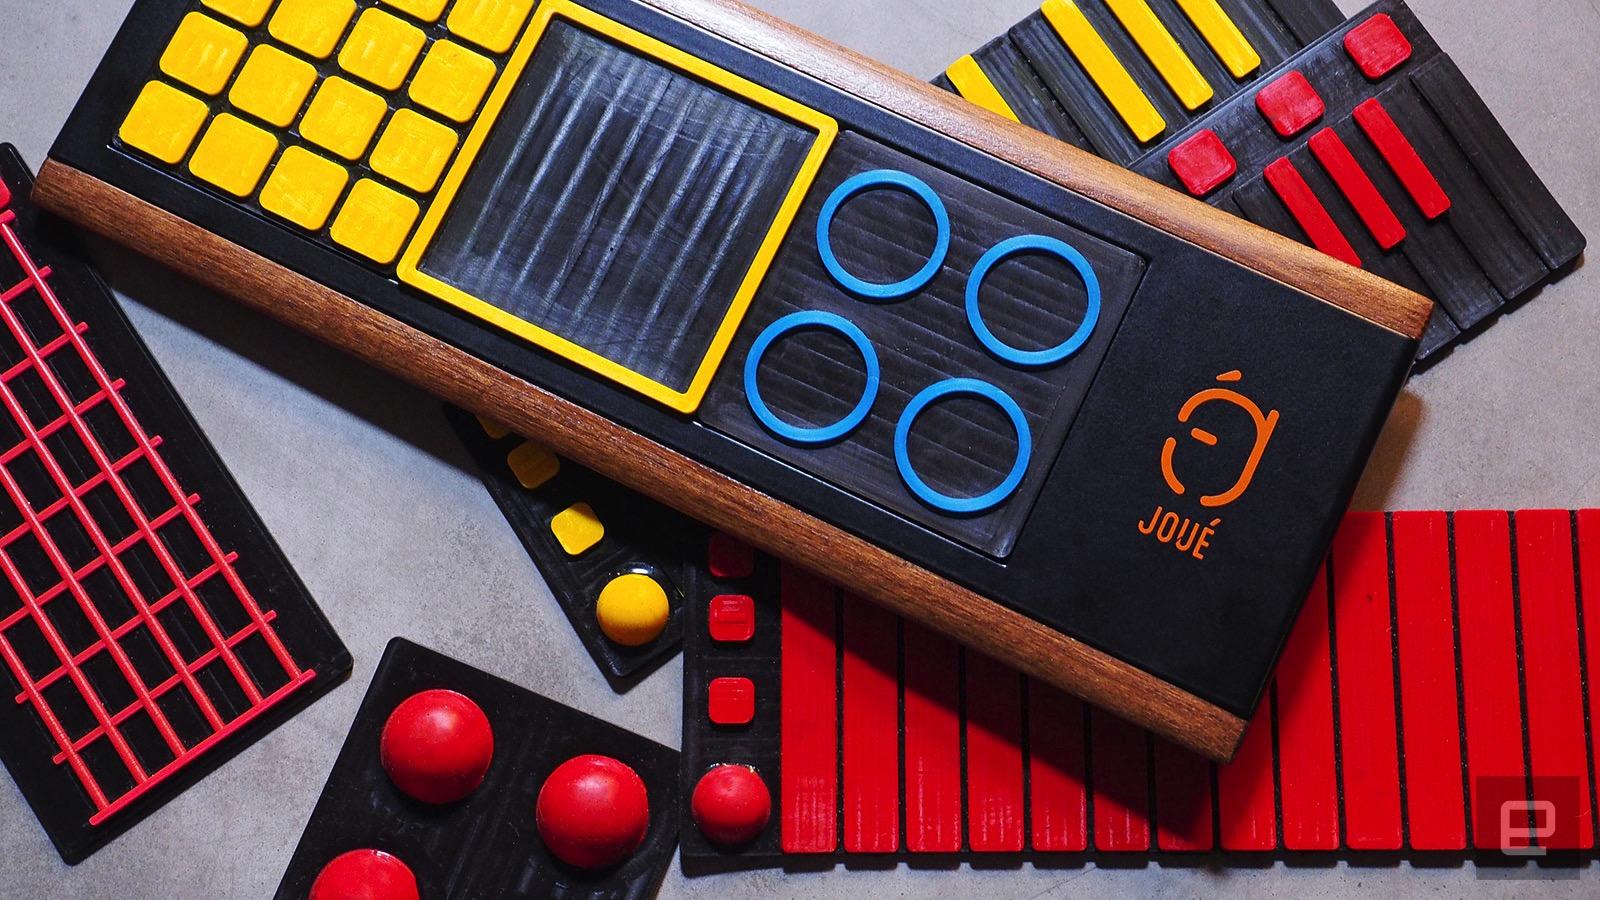 Joue s MIDI controller adds tactile fun to music-making